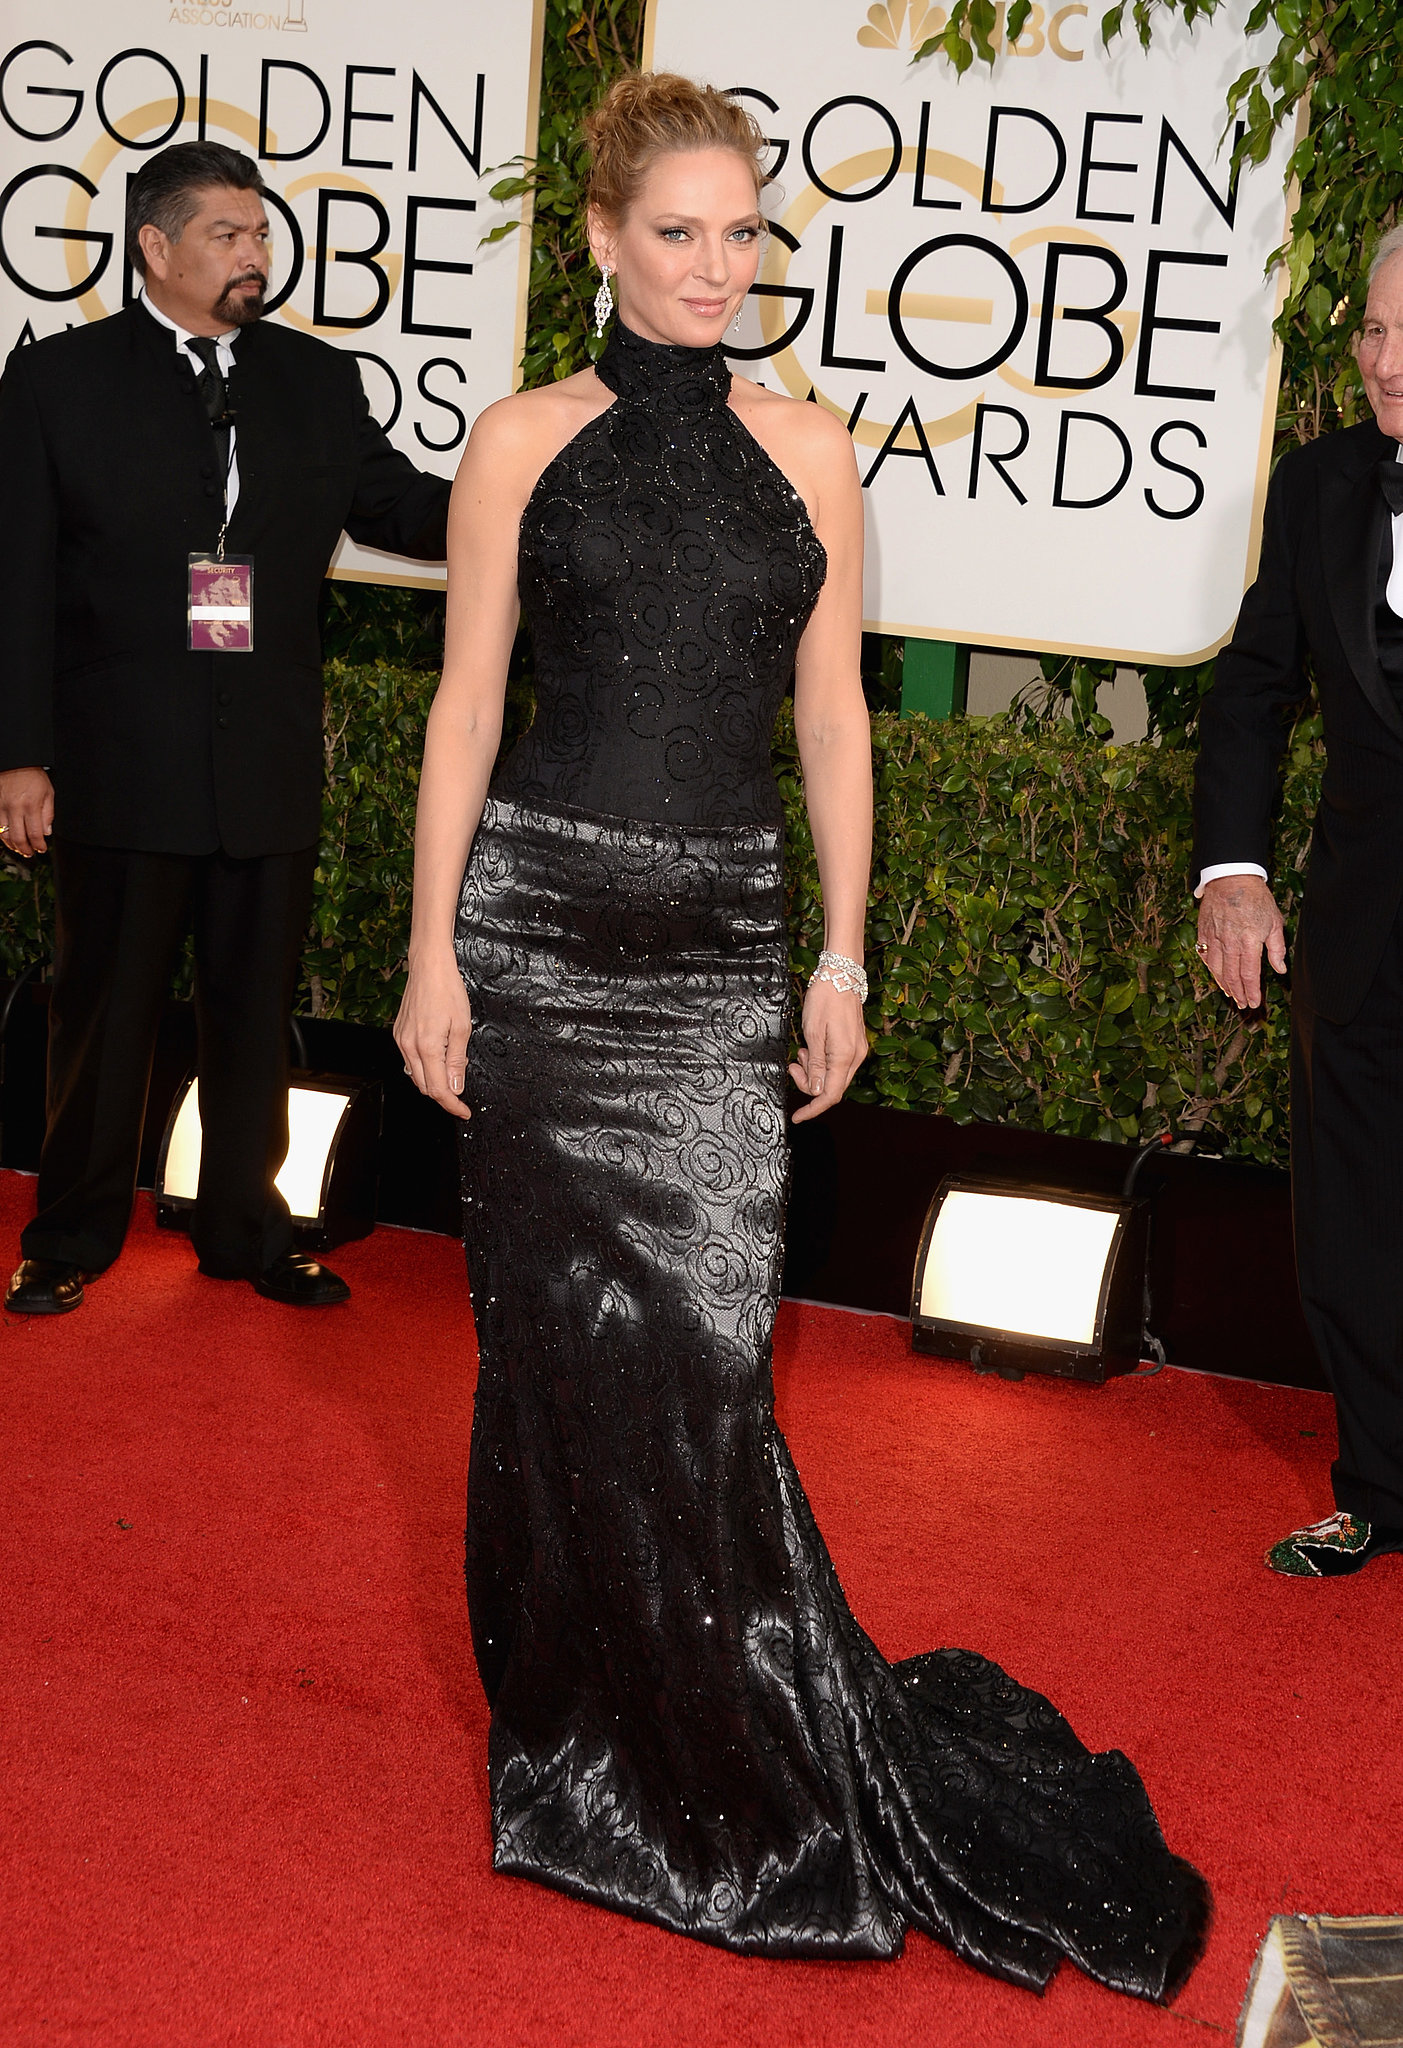 Uma Thurman kept things glamorous on the red carpet.